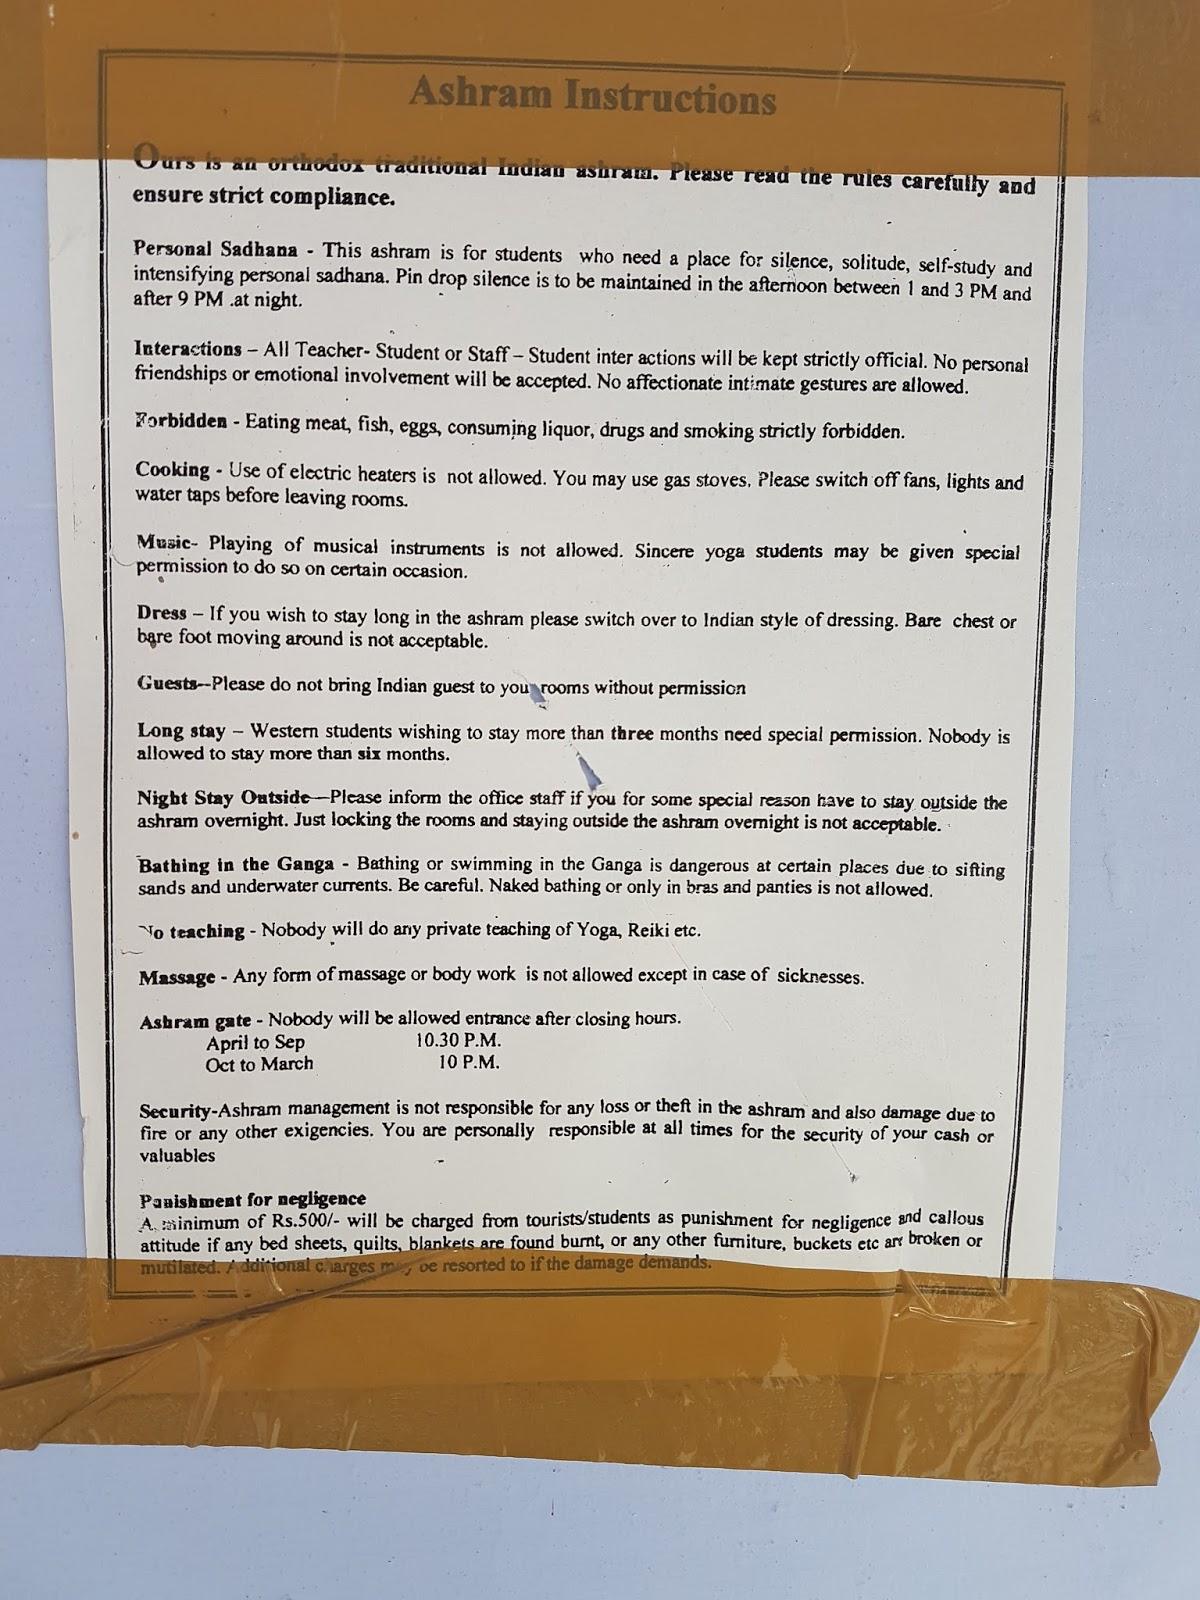 Staying in an ashram in Rishikesh India - Ummi Goes Where?